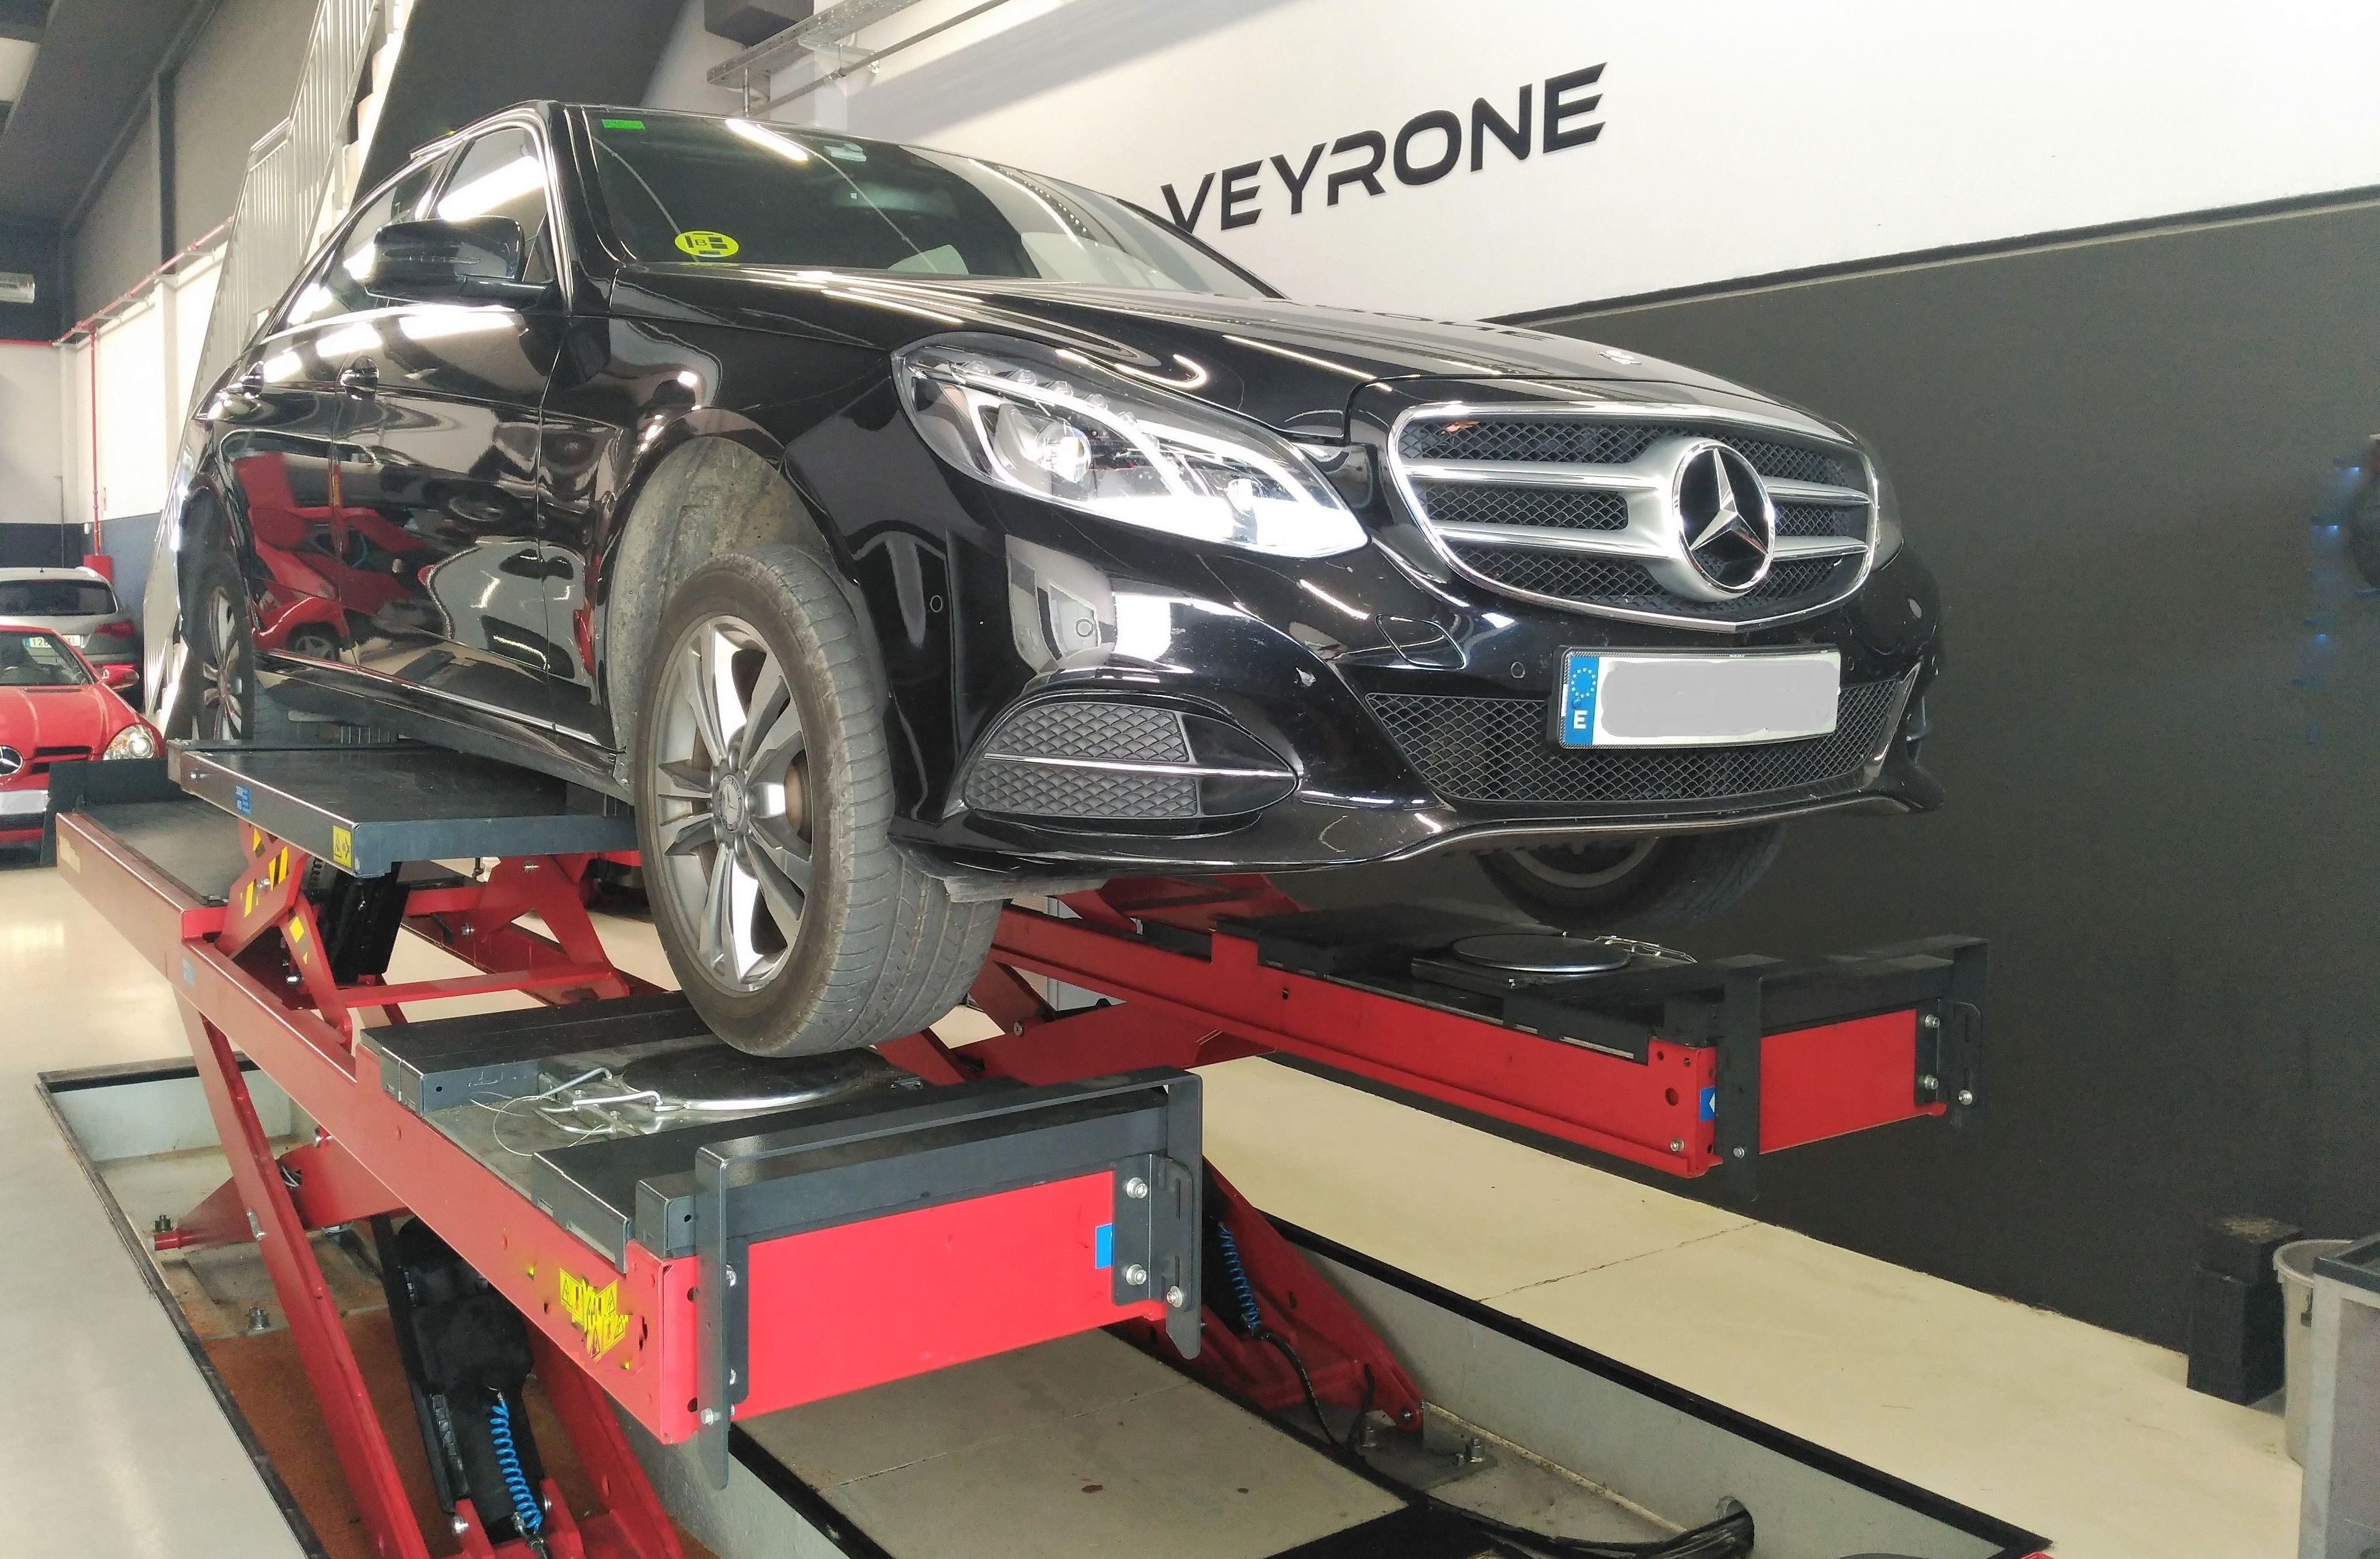 Foto 18 de Talleres de automóviles en Vilafranca del Penedès | Garatge Veyrone G3